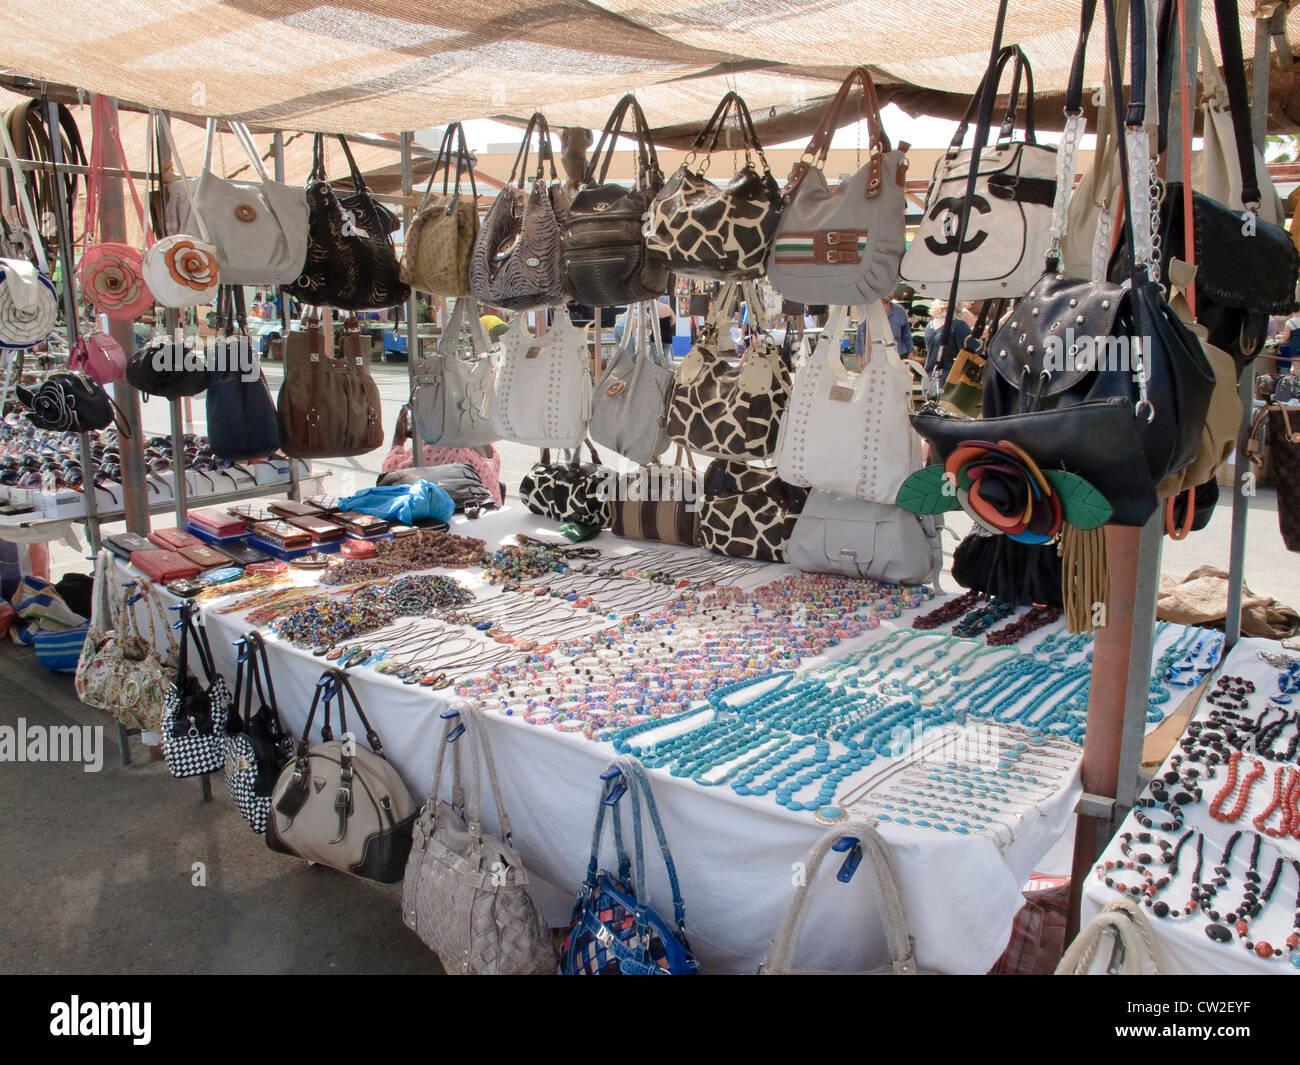 Market stalls Baku Water Park Corralejo La Oliva Fuerteventura Canary Islands Spain - Stock Image